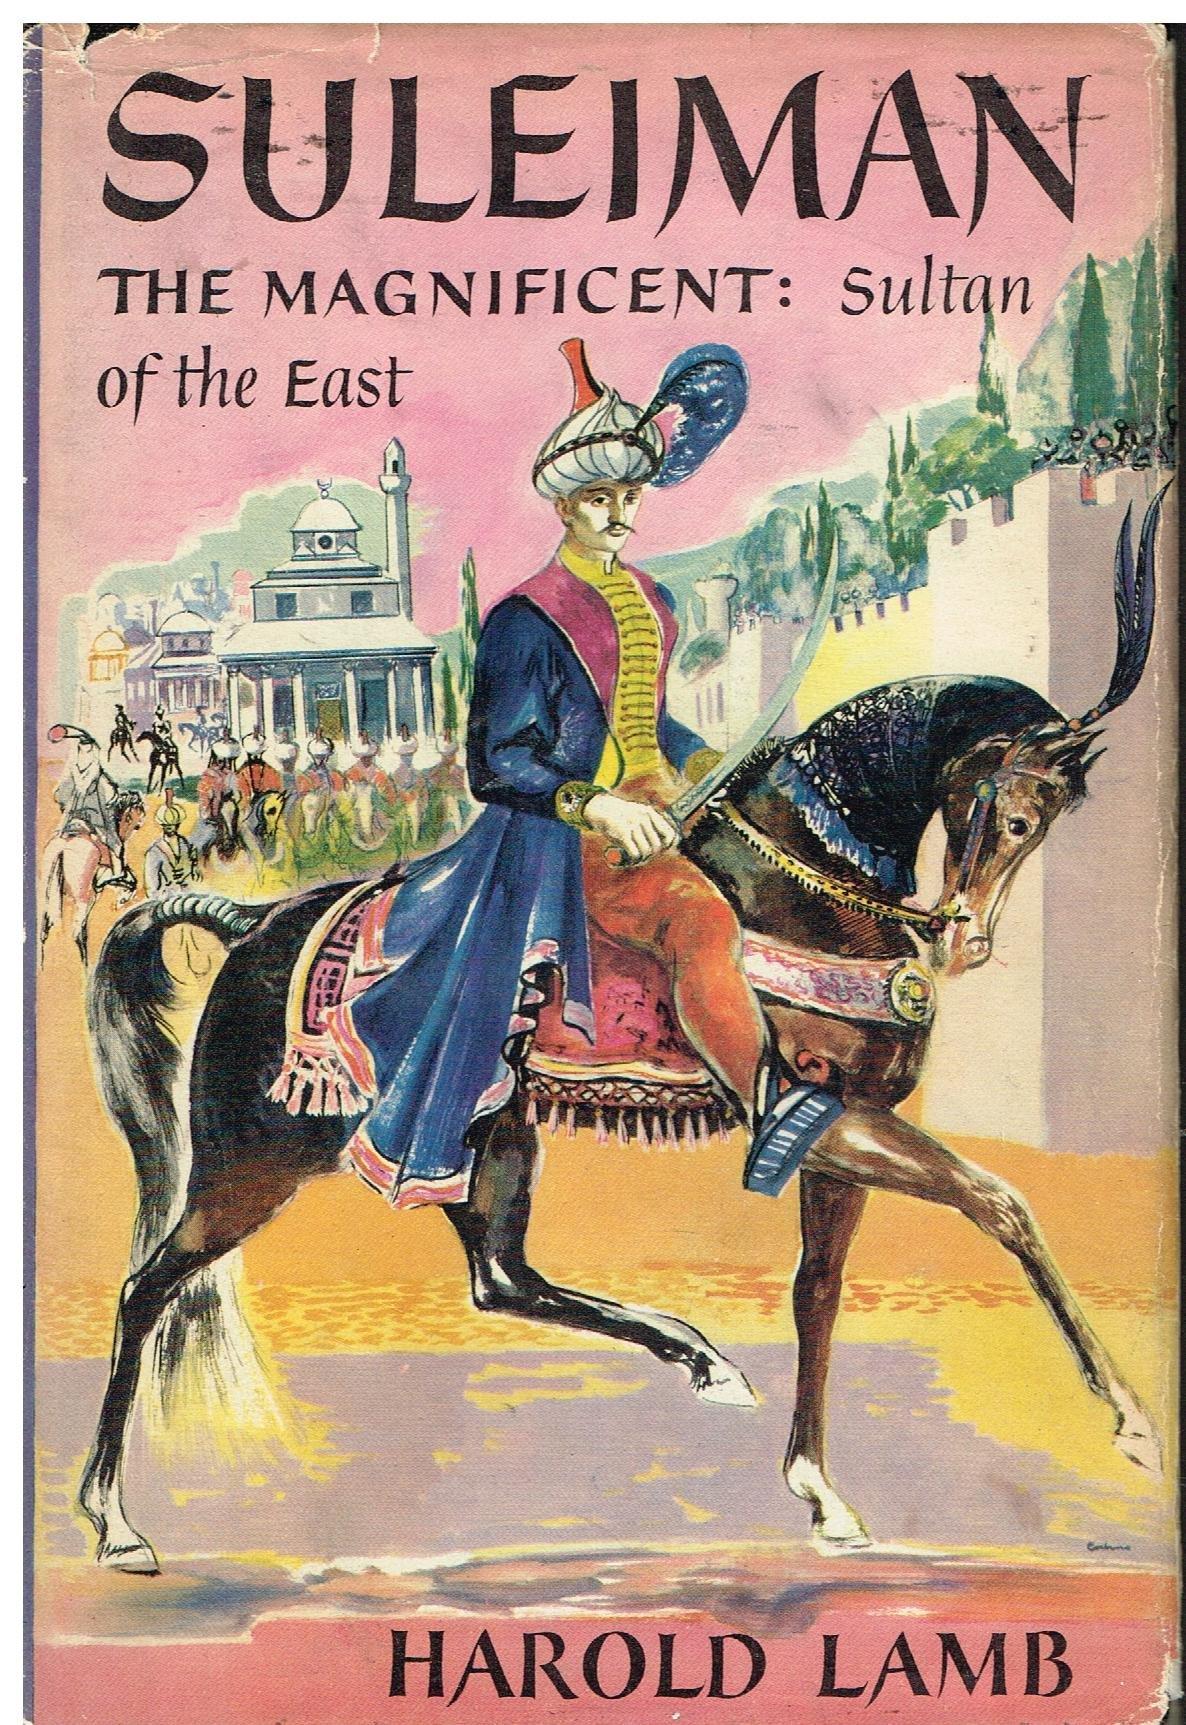 Suleiman, the Magnificent, : Sultan of the East: Harold Lamb: Amazon.com:  Books